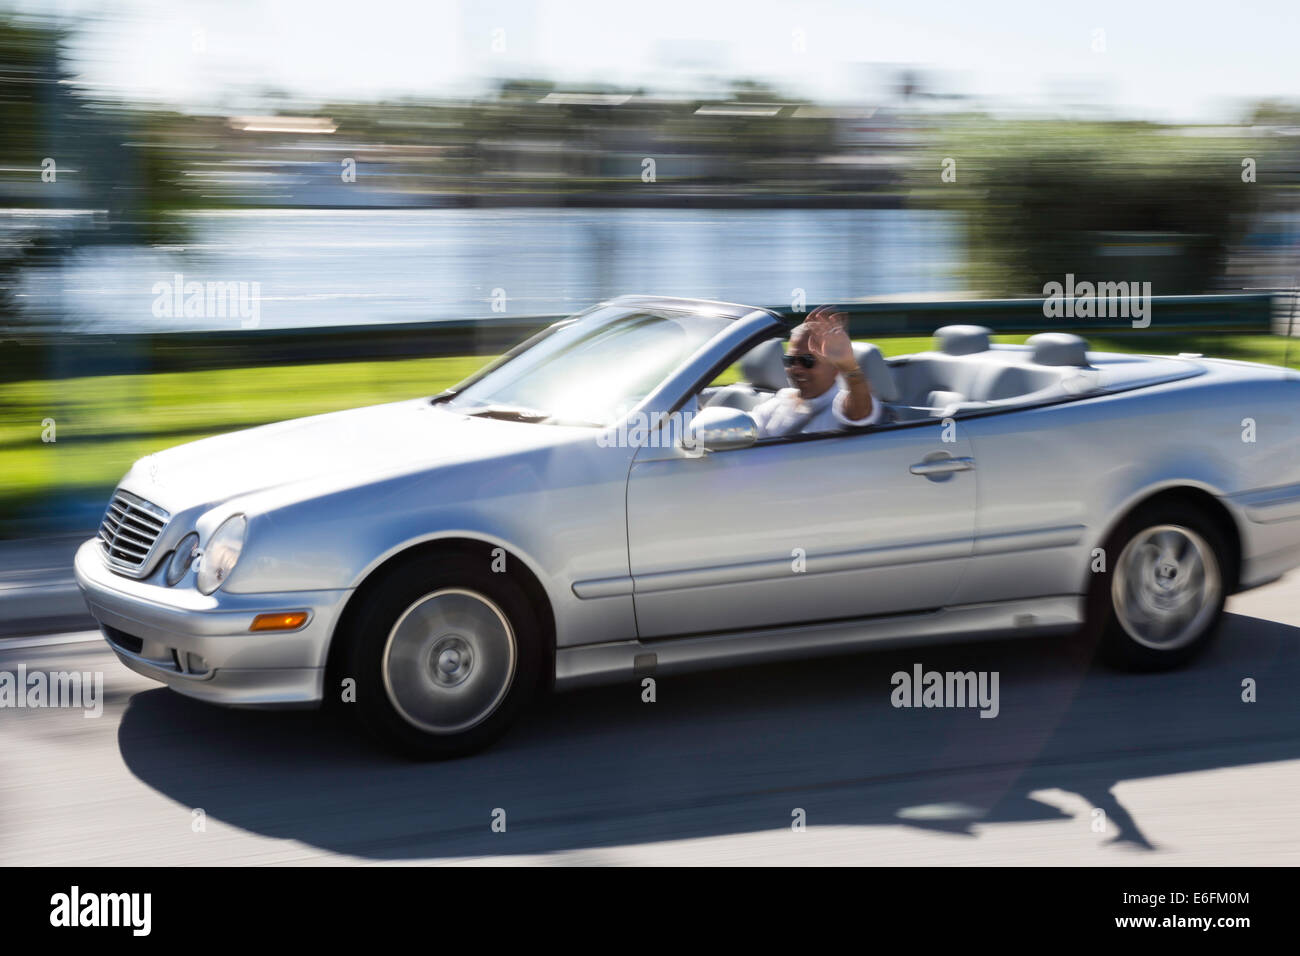 Caucasian Man Driving Luxury Convertible Car, Ft Lauderdale, FL, USA Stock Photo